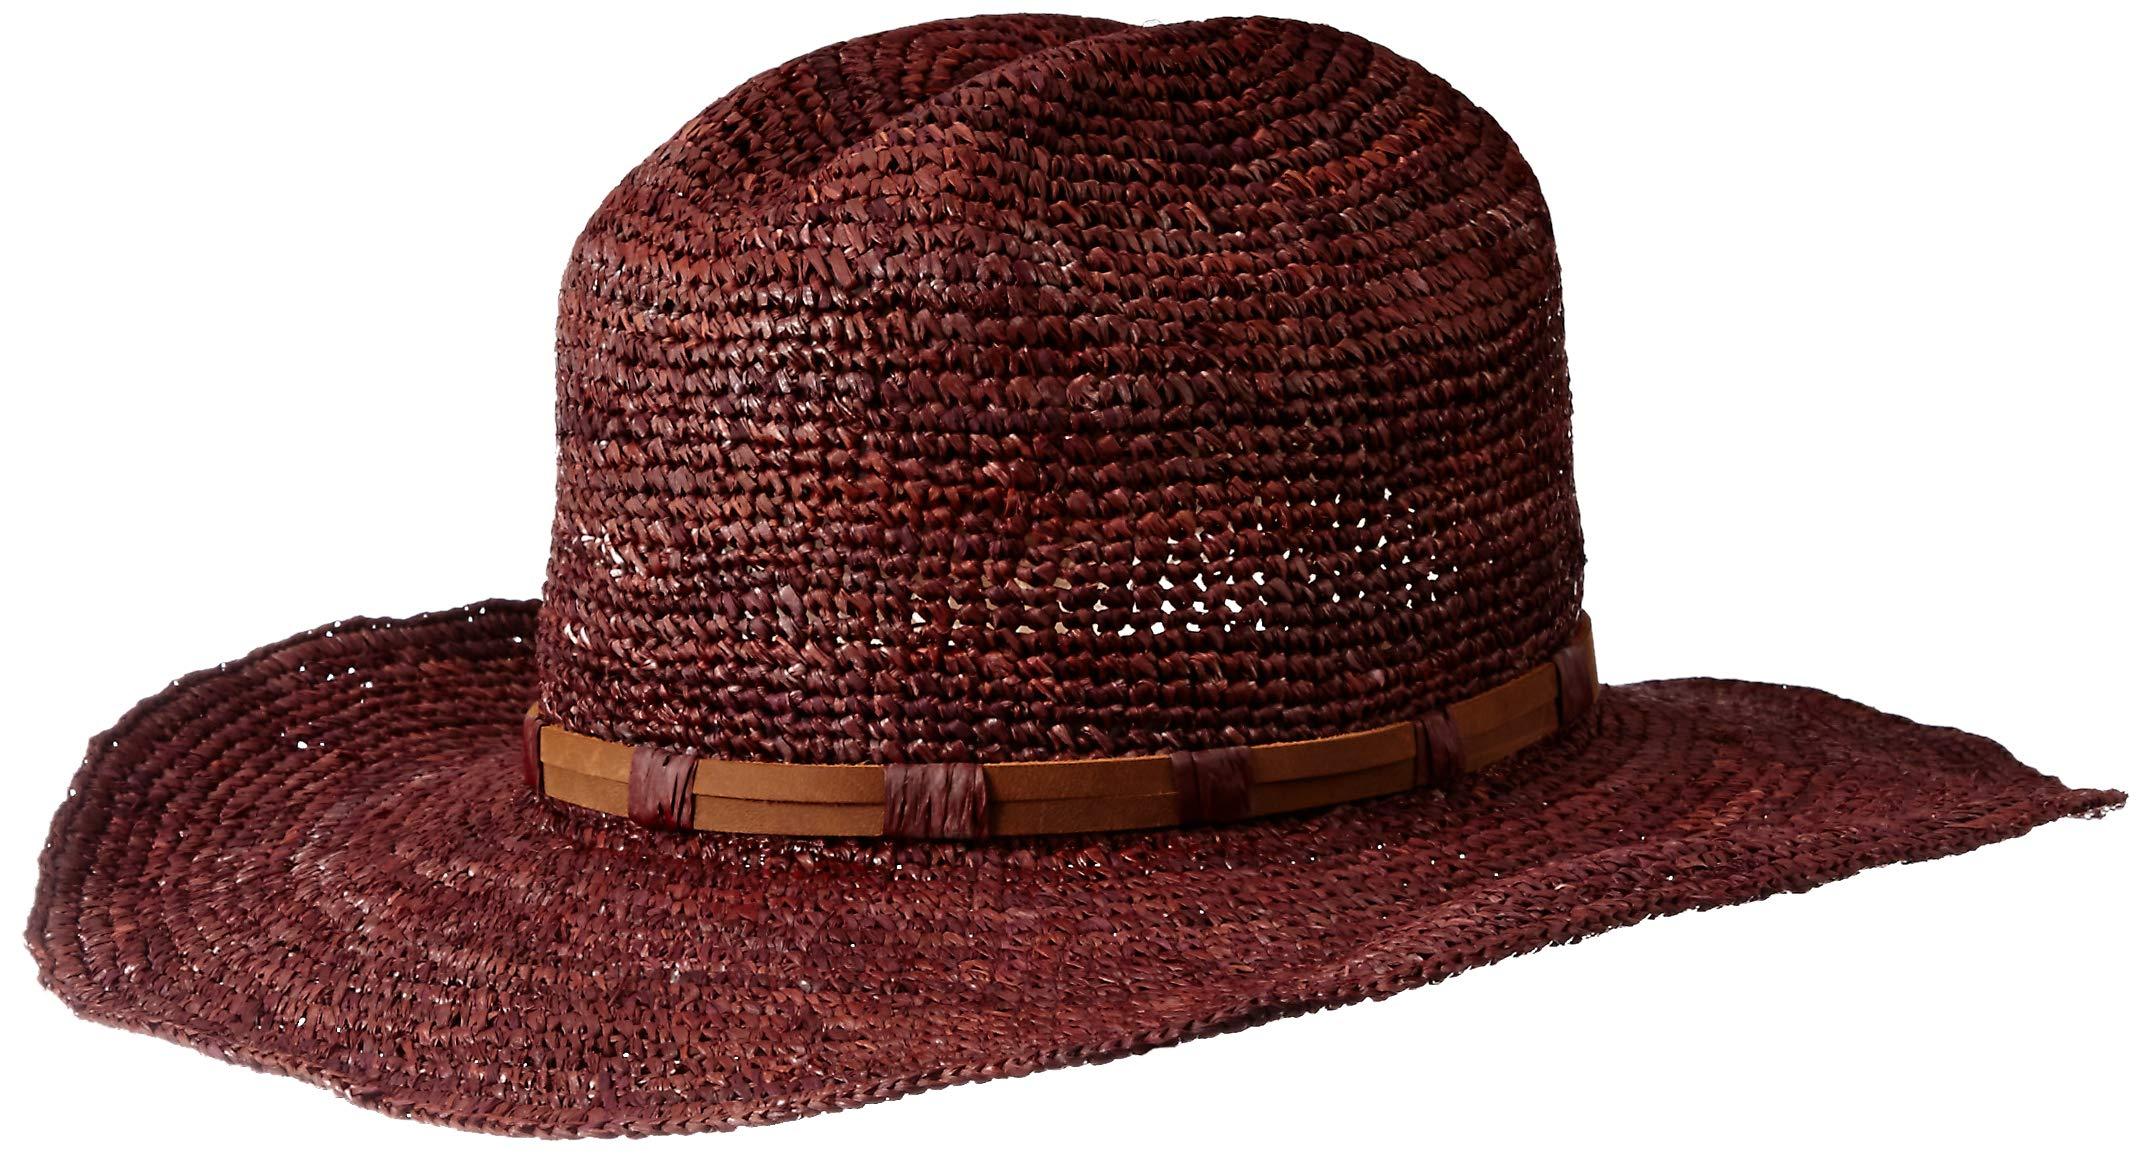 Frye Headwear Women's Frye Raffia Cowboy Dean, Umber, Medium/Large